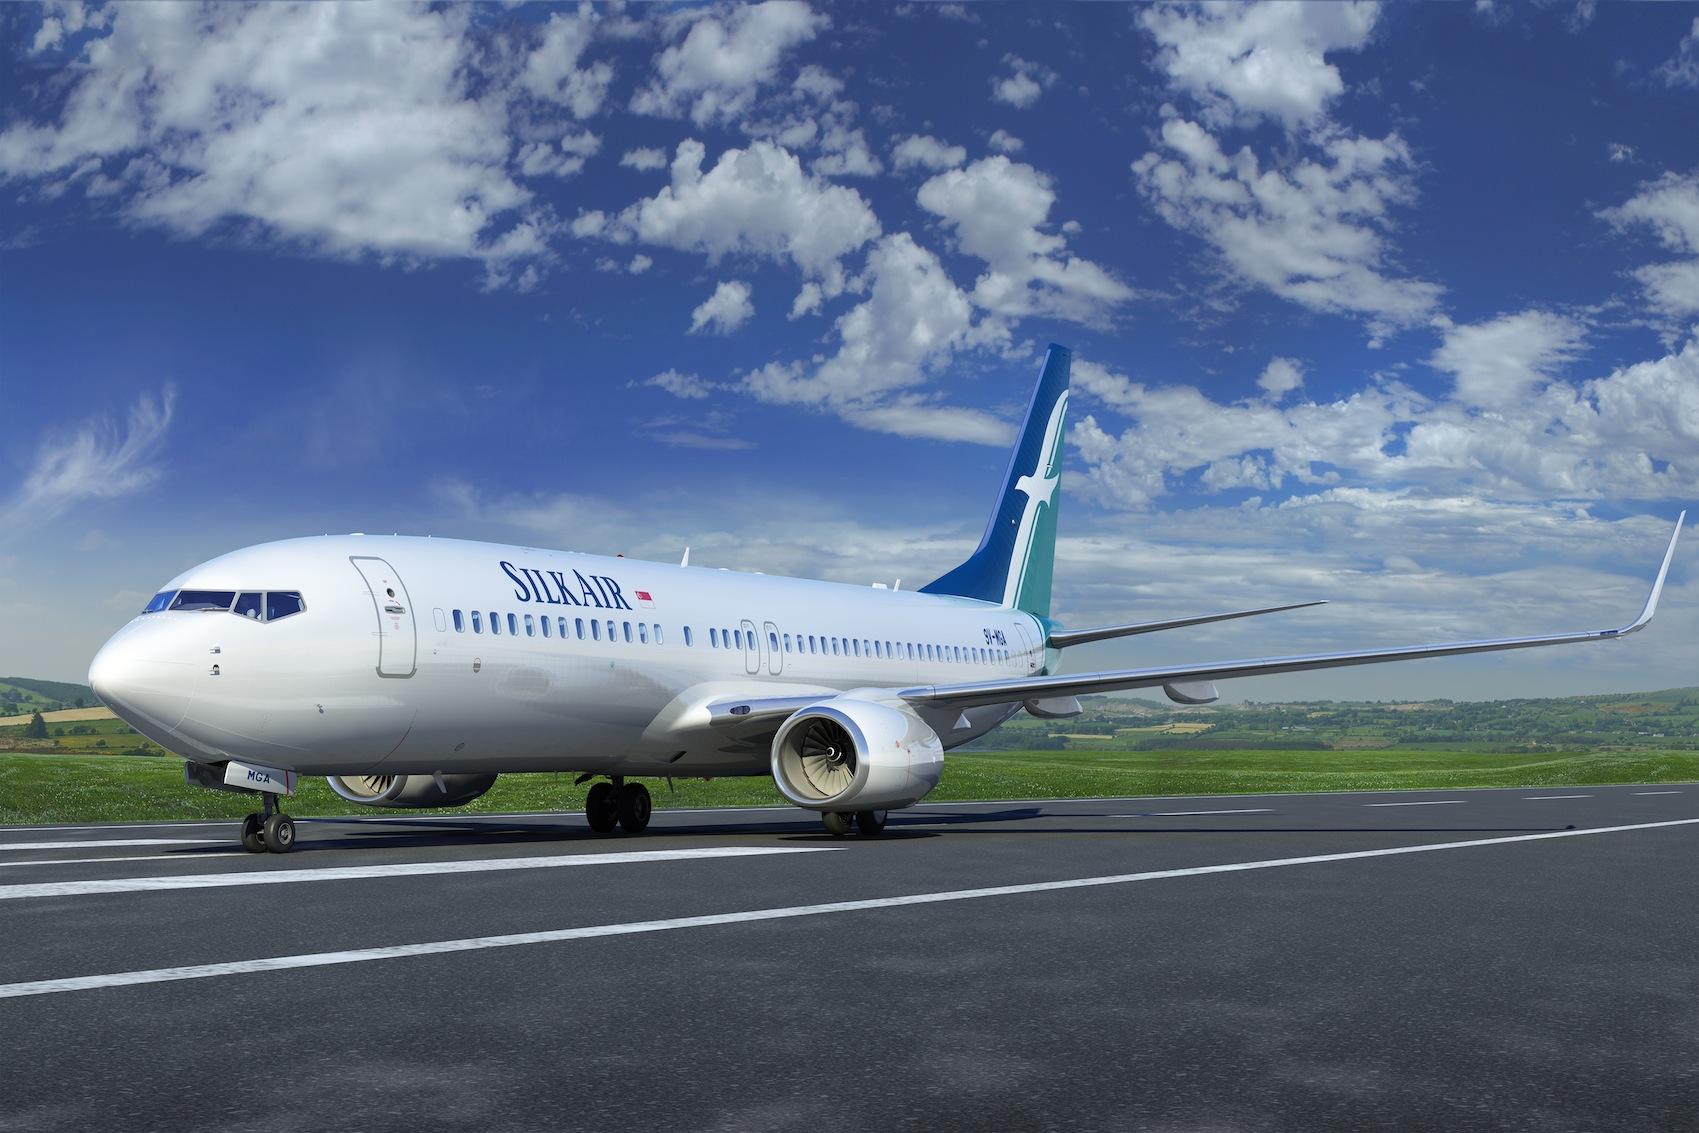 Untuk promo ini, penerbangan sambungan dari Jakarta ke Singapura dilayani menggunakan Silkair atau Singapore Air.